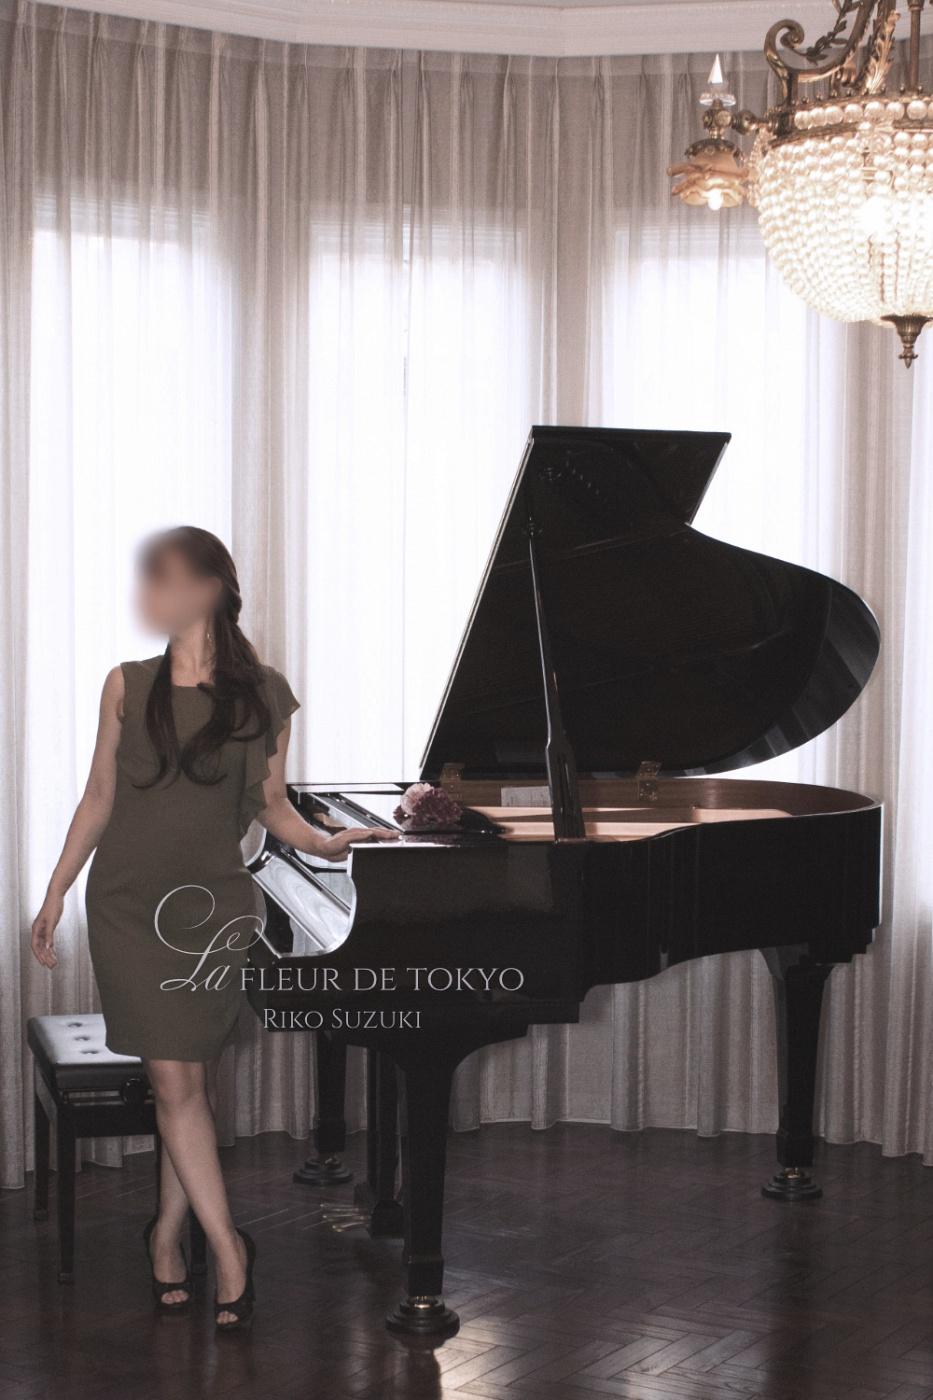 Riko from Tokyo